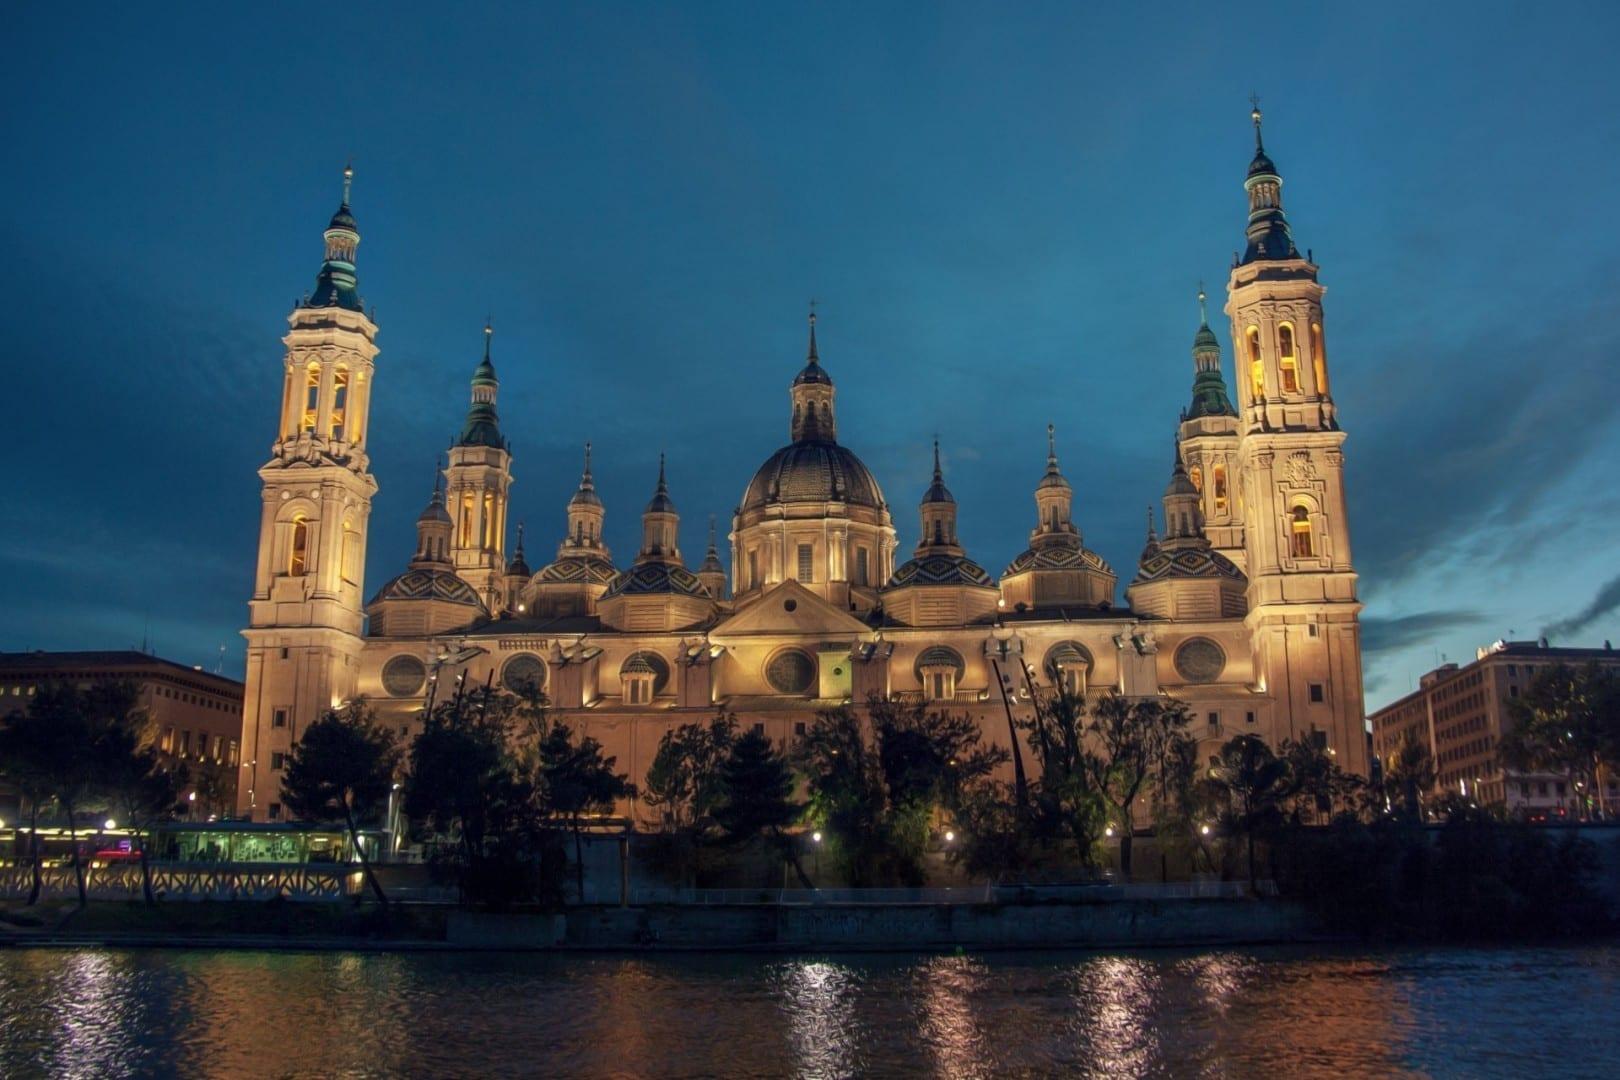 Basílica del Pilar Zaragoza España